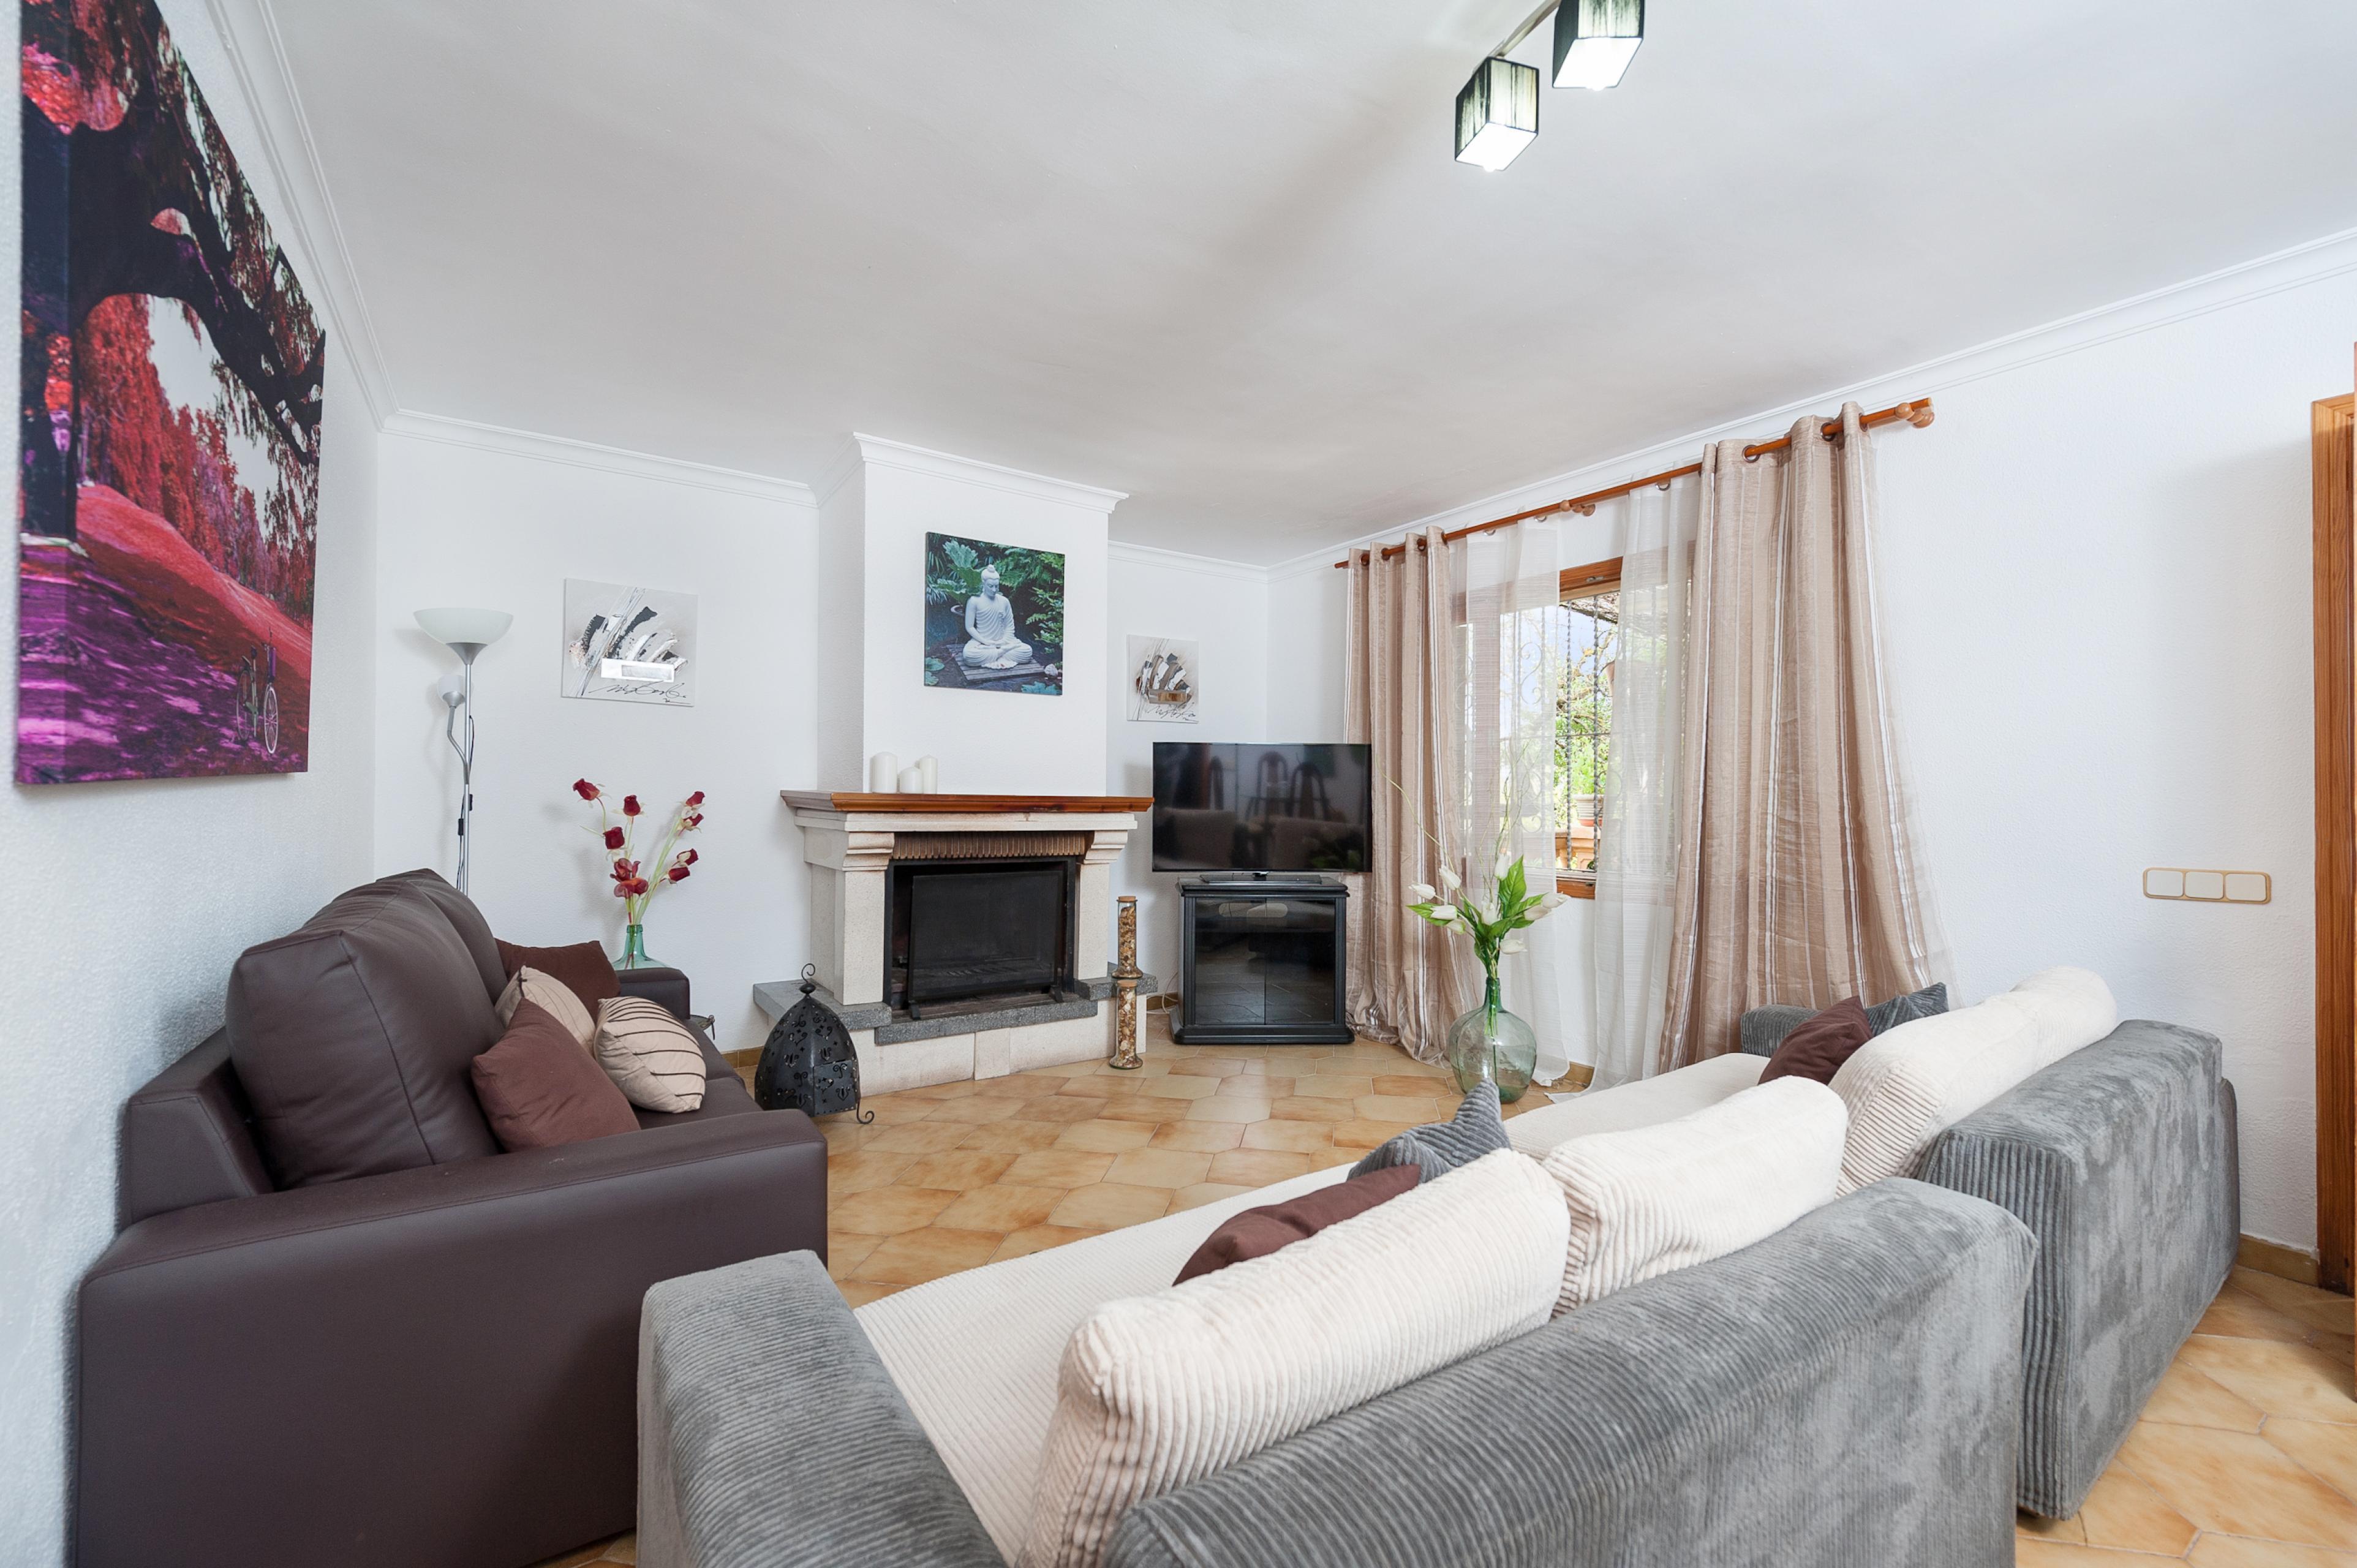 Maison de vacances CA'N LLUC- Alaró- MALLORCA - Kostenloses WLAN (2687507), Alaro, Majorque, Iles Baléares, Espagne, image 17